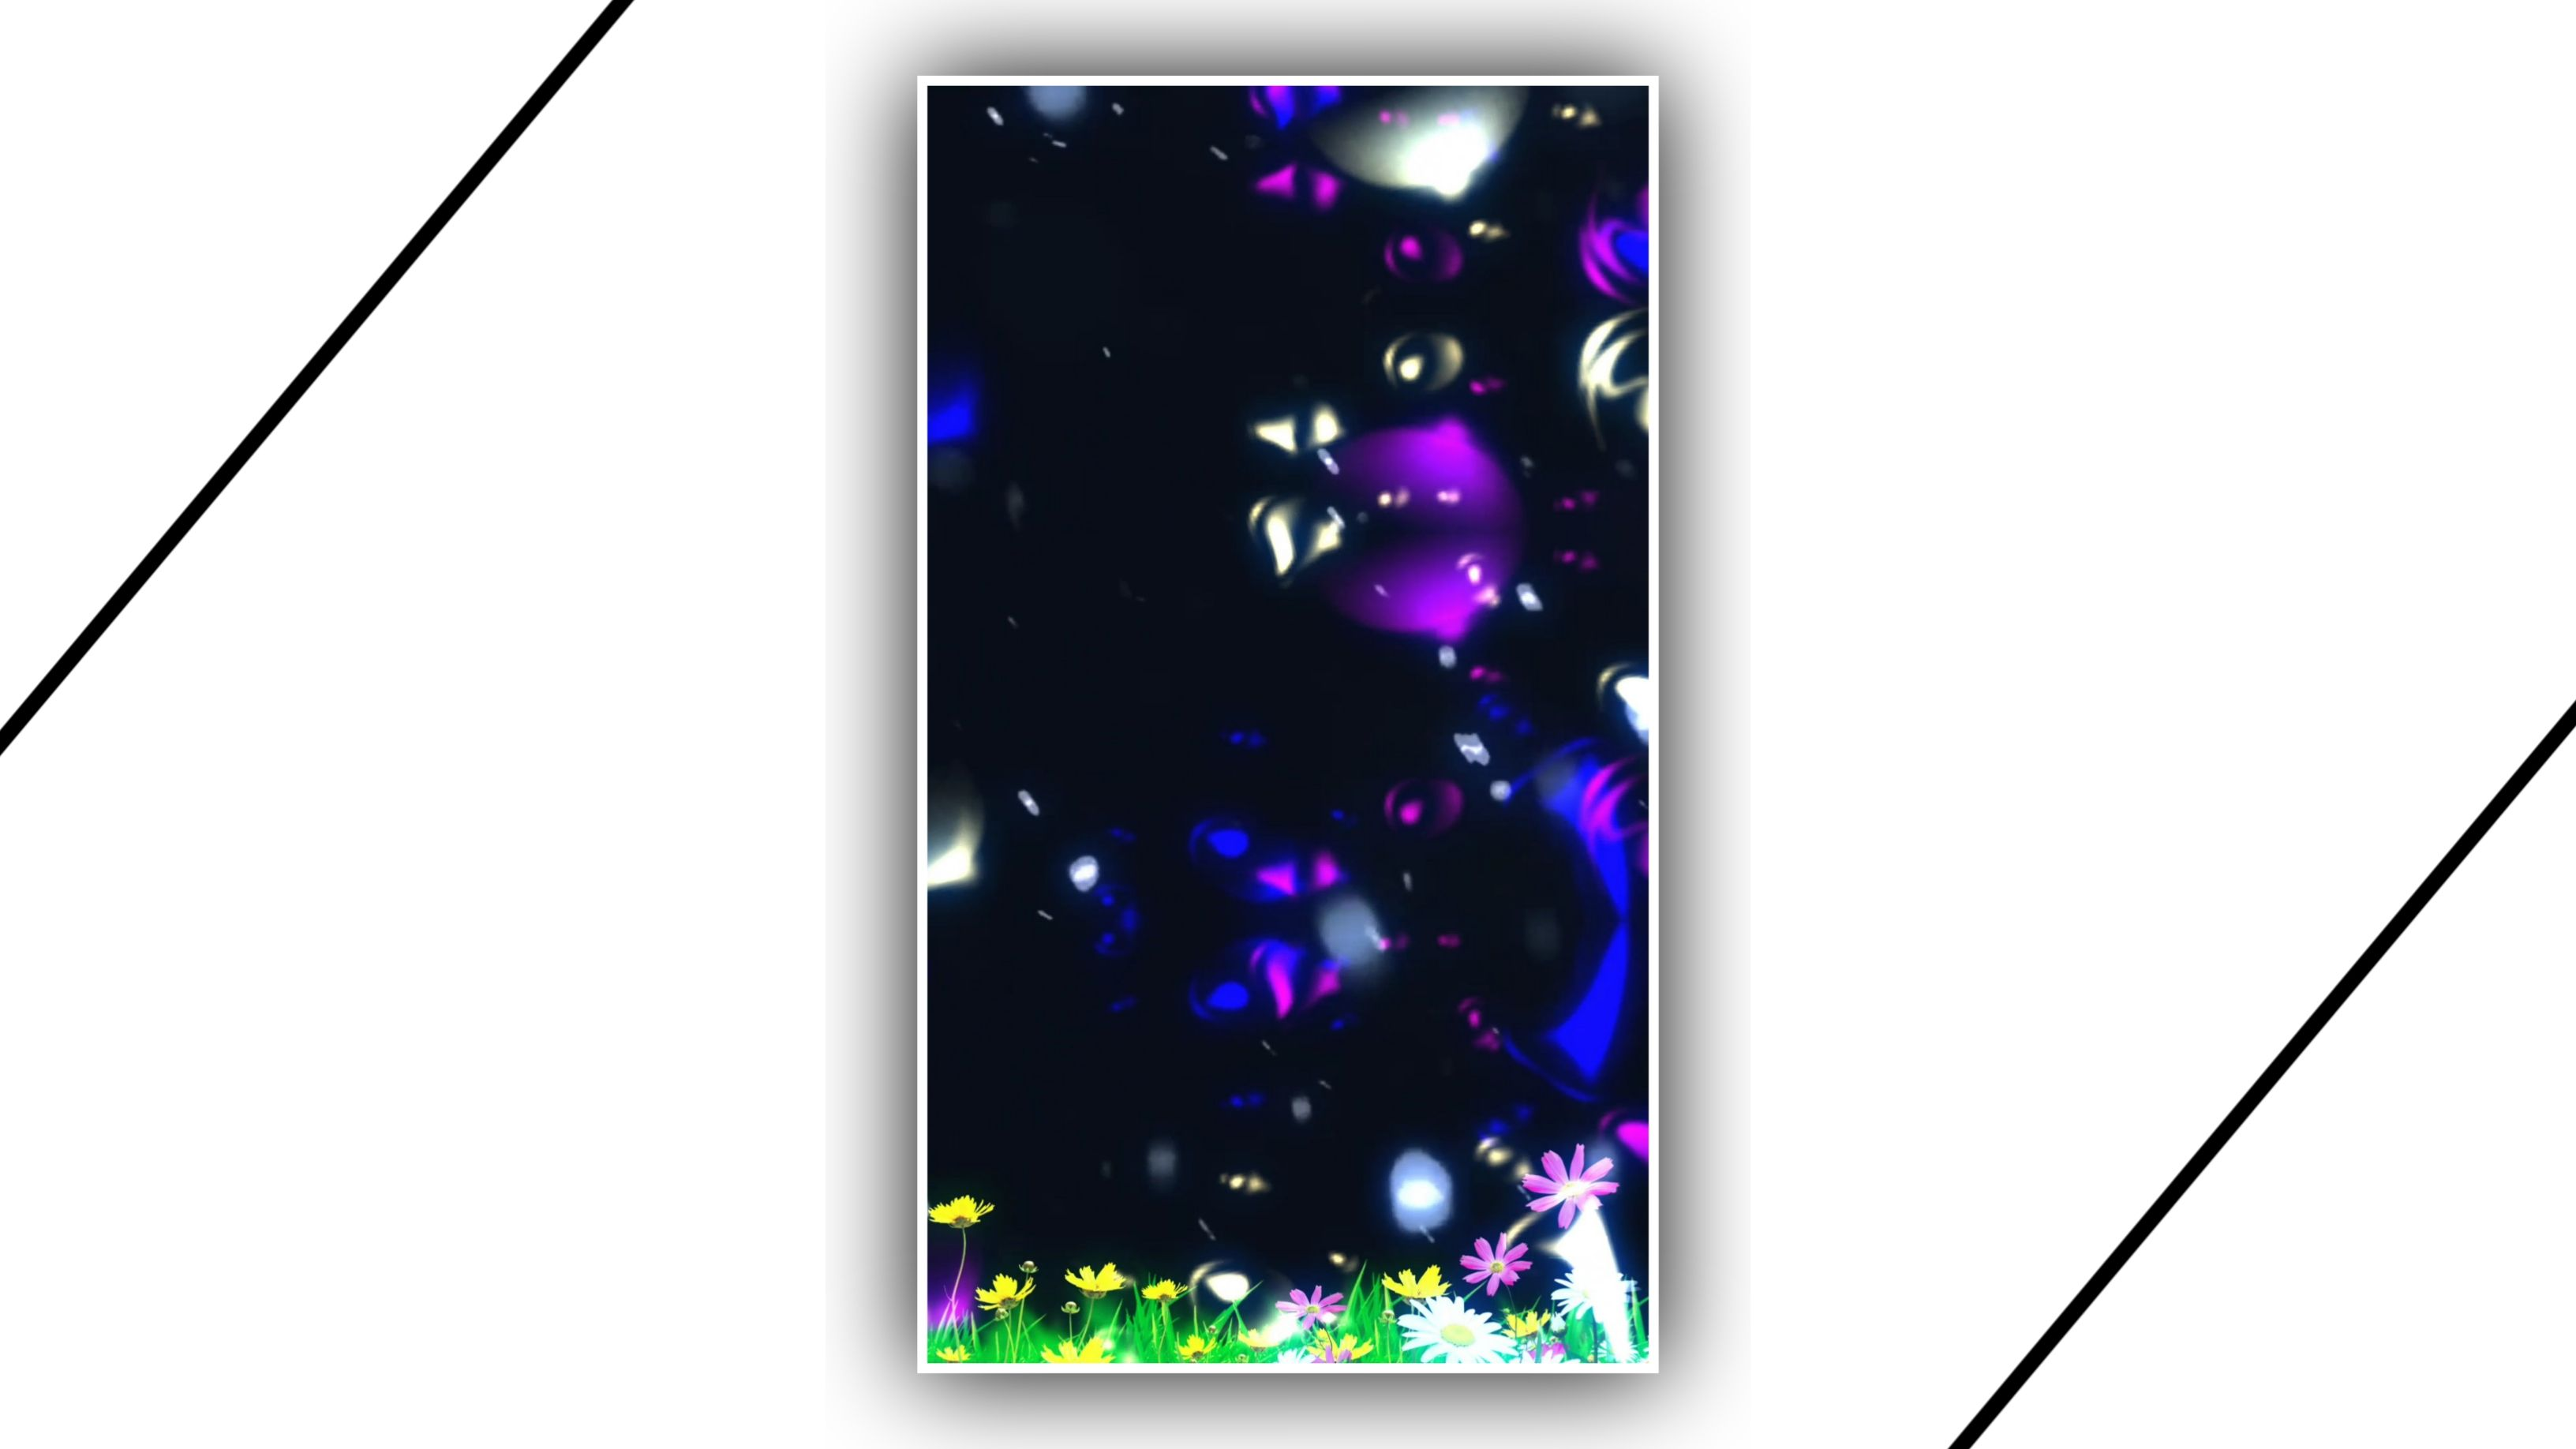 Lighting Steels Particles Kinemaster Template